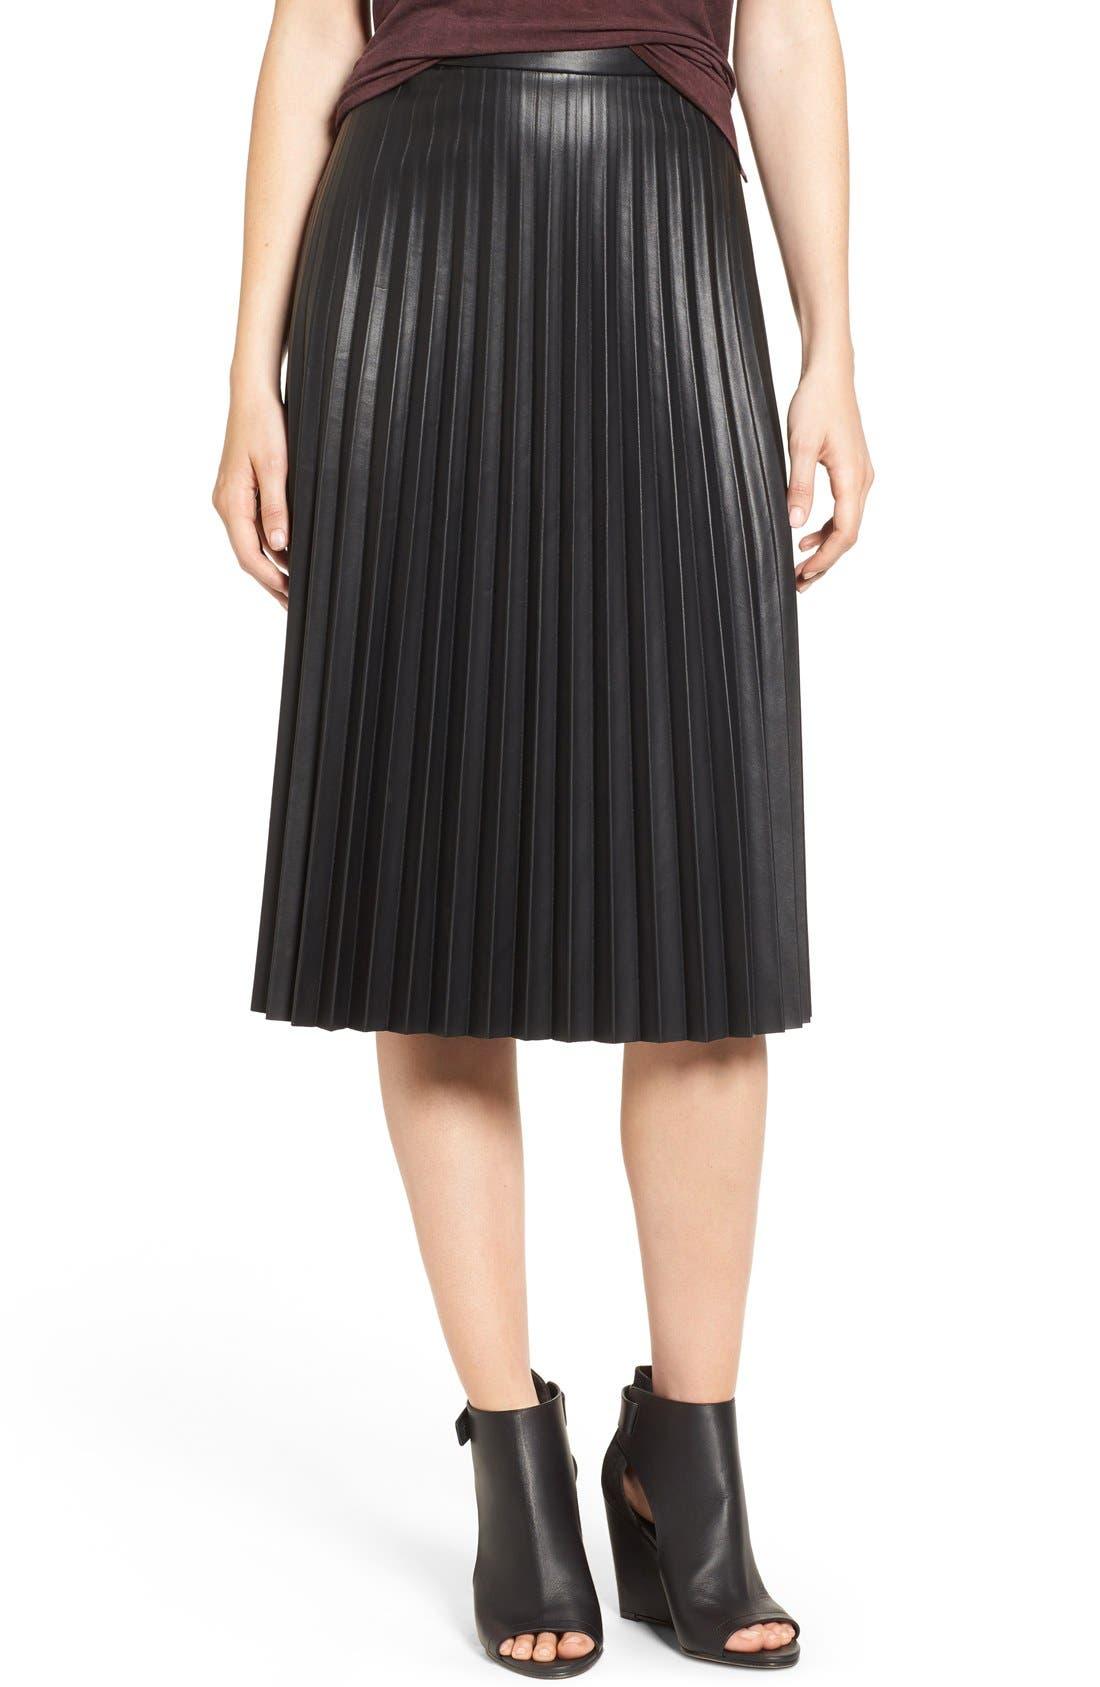 Alternate Image 1 Selected - Trouvé Faux Leather Pleat Skirt